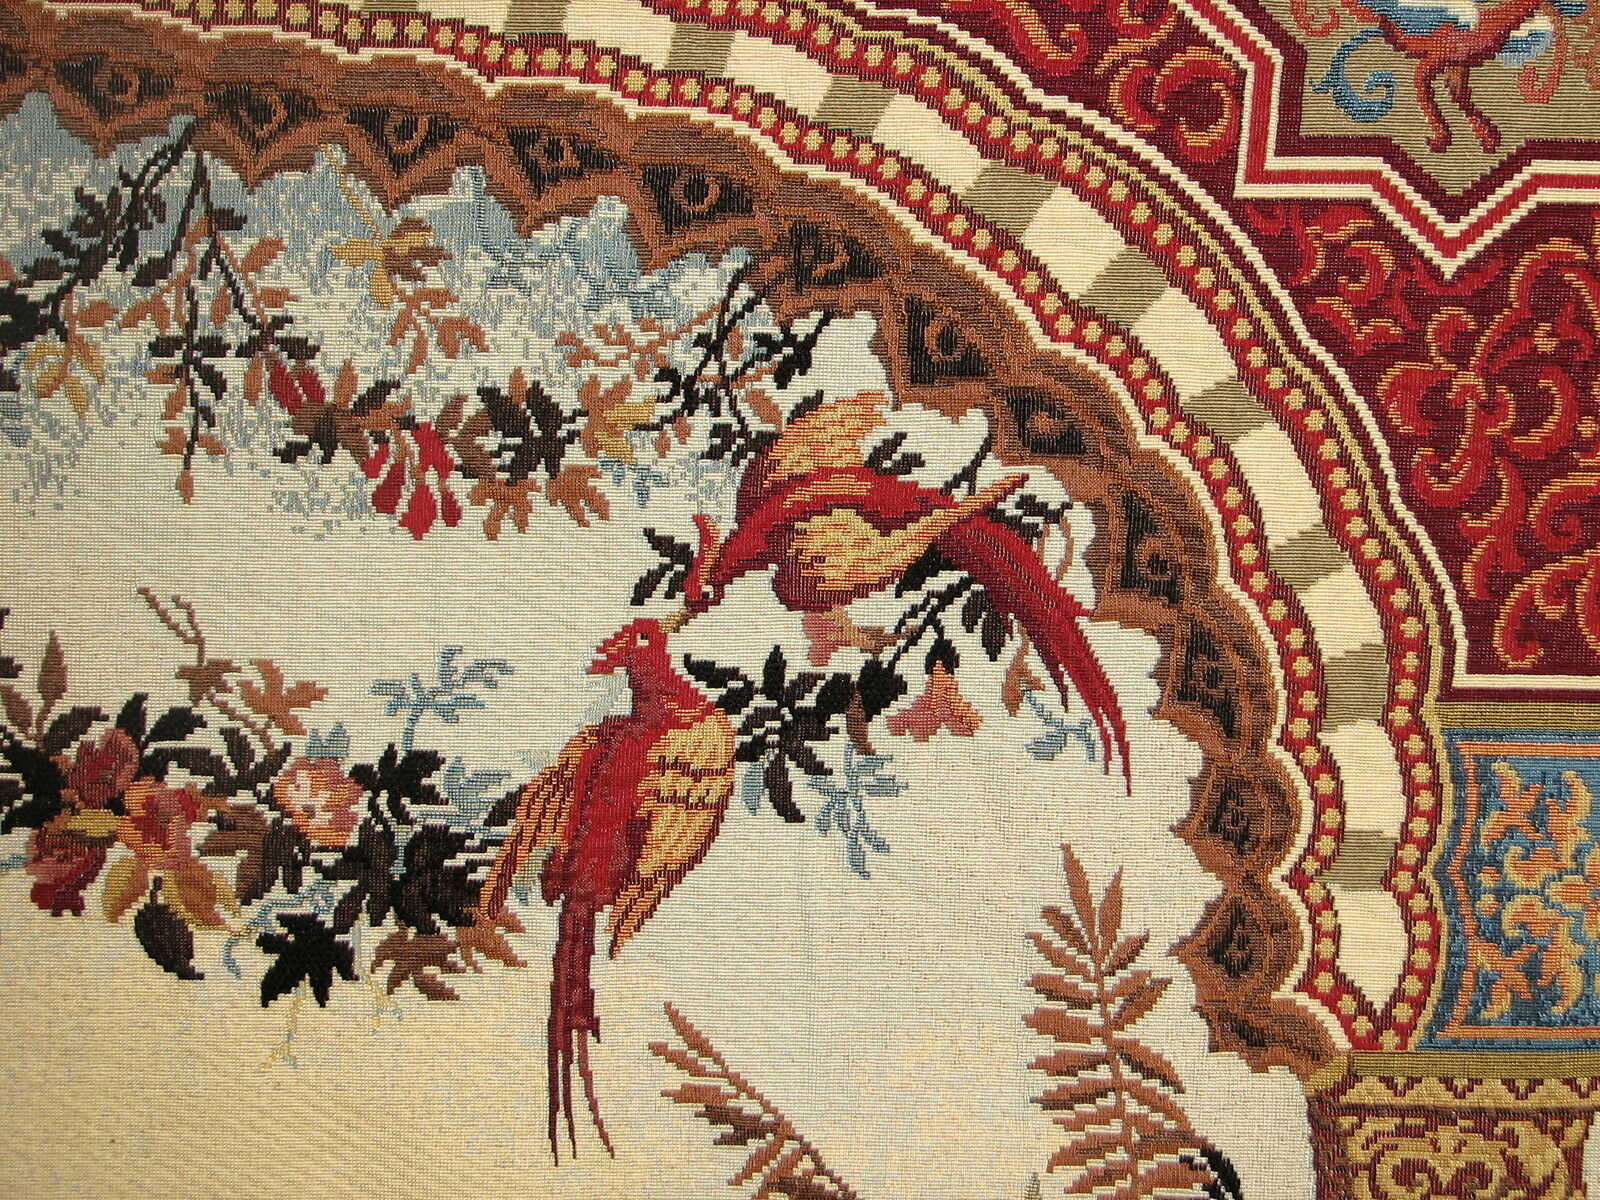 BELLA qualità belga tessuti Tapestry Wall Wall Wall da appendere  l'elefante , 54  X 70  5b0973